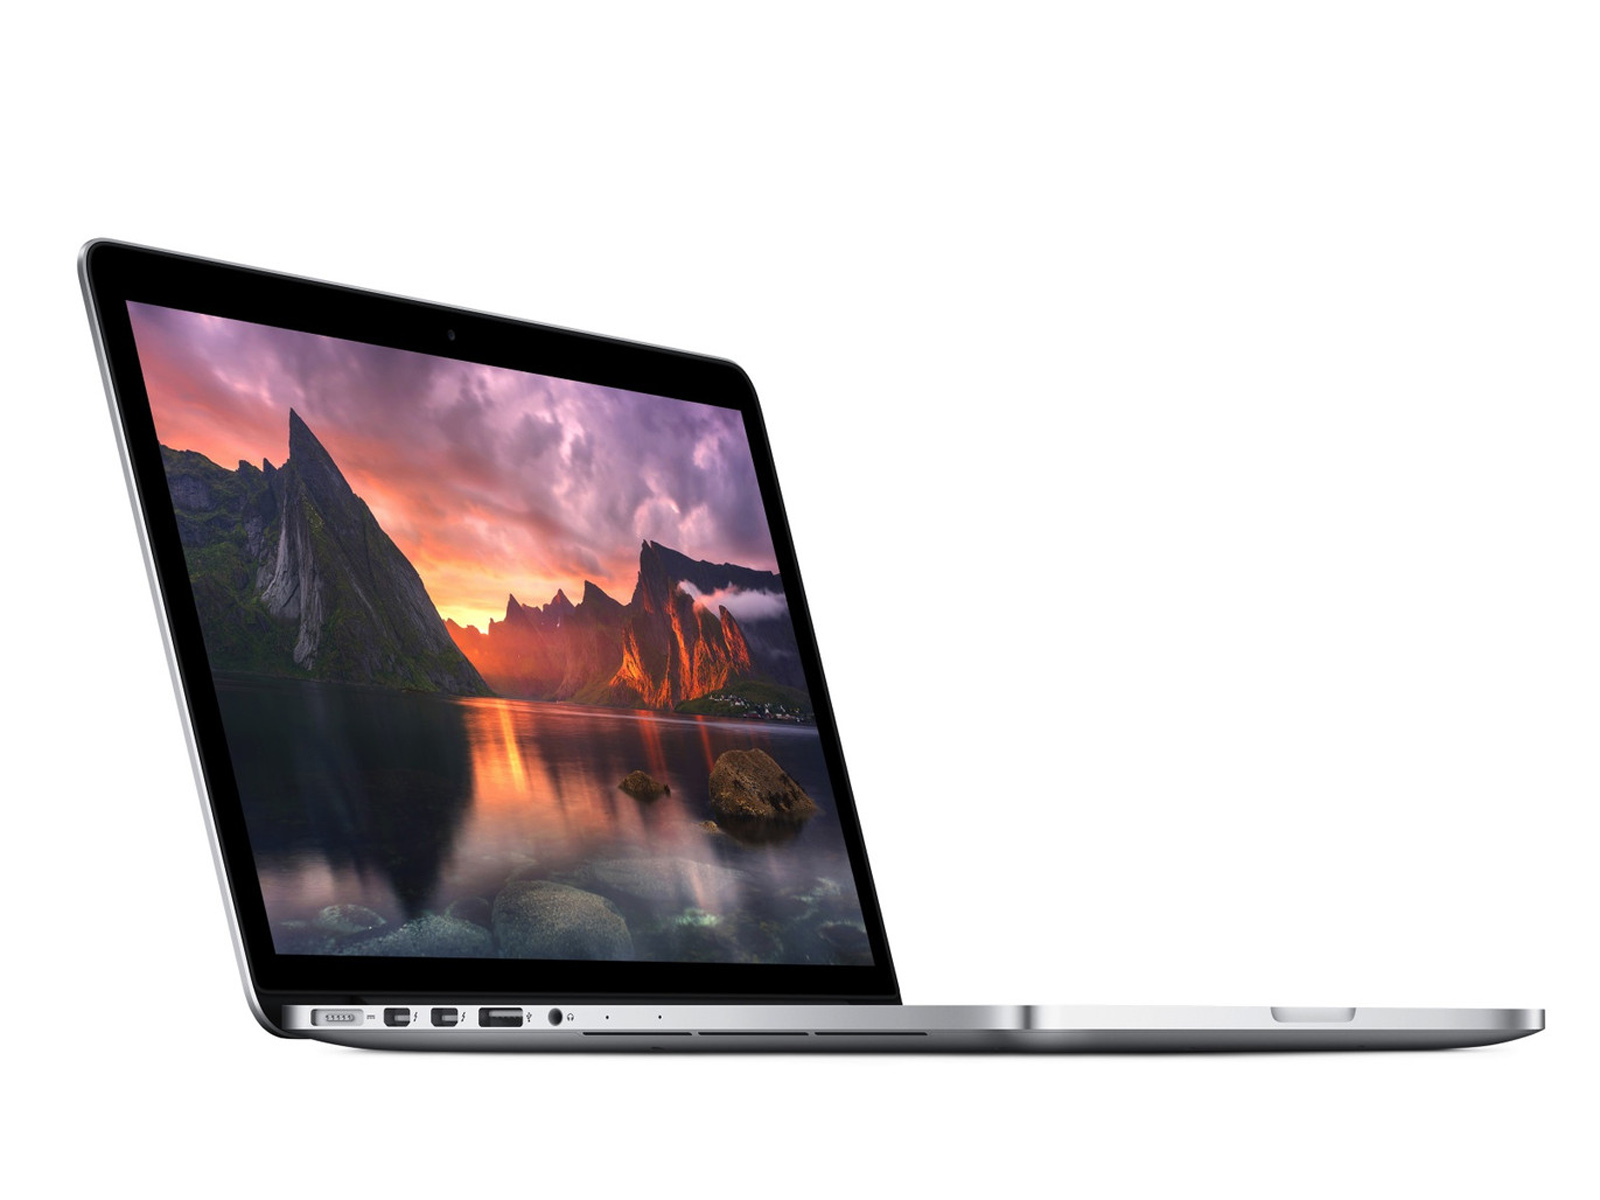 MacBook Pro 13-inch- Retina display